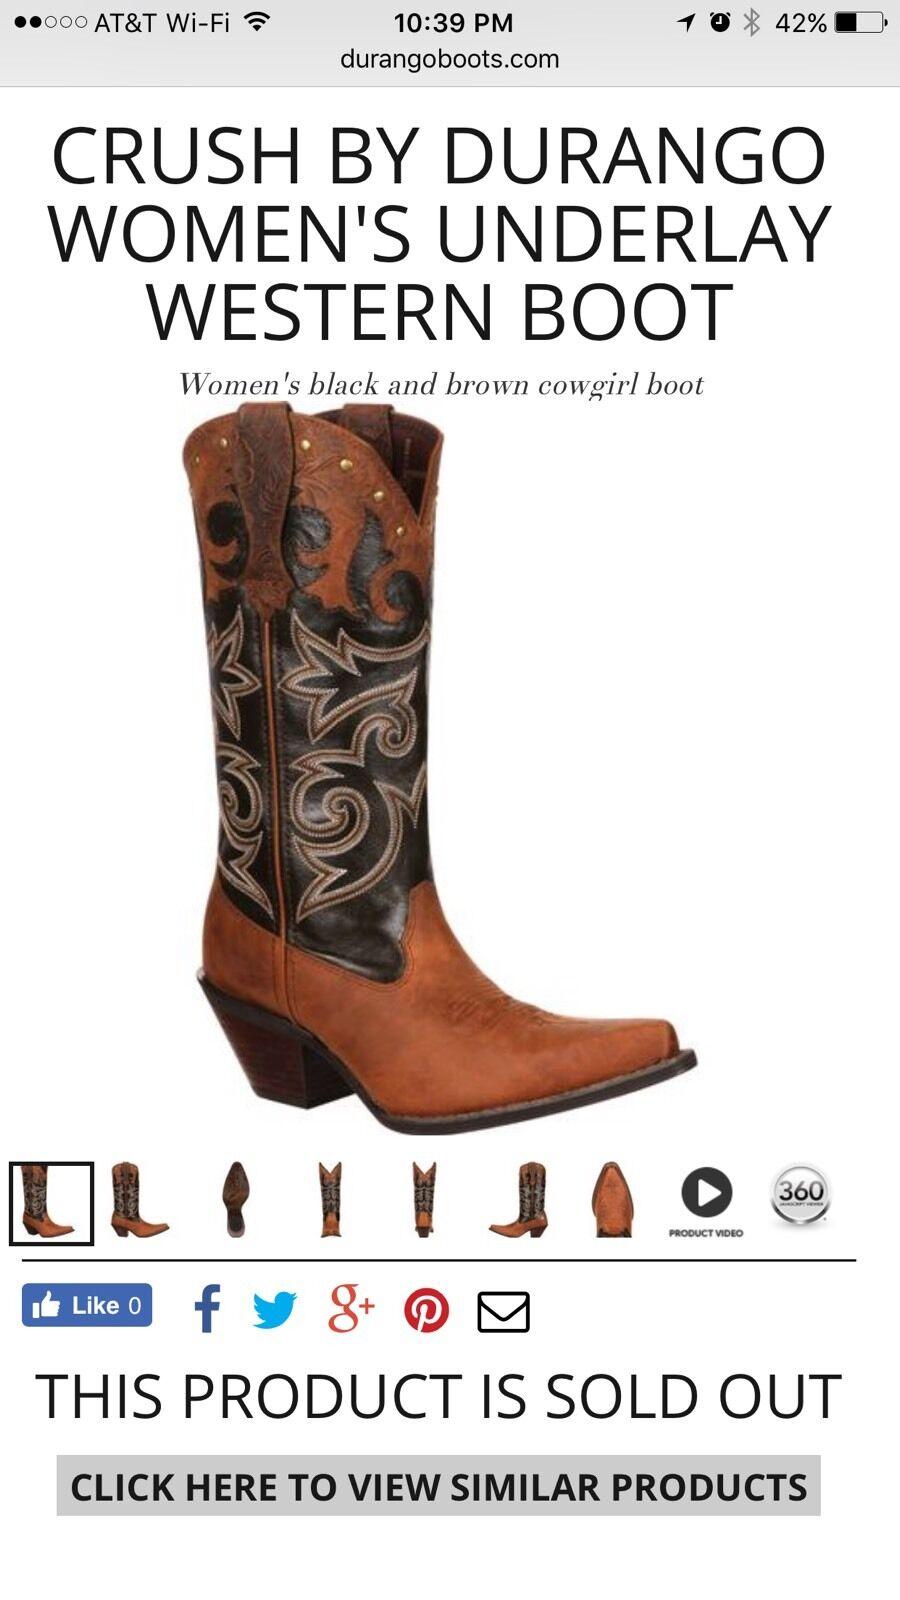 Durango Crush Cowgirl Western Boots DRD0066 Gypsy Underlay Women's 9 M